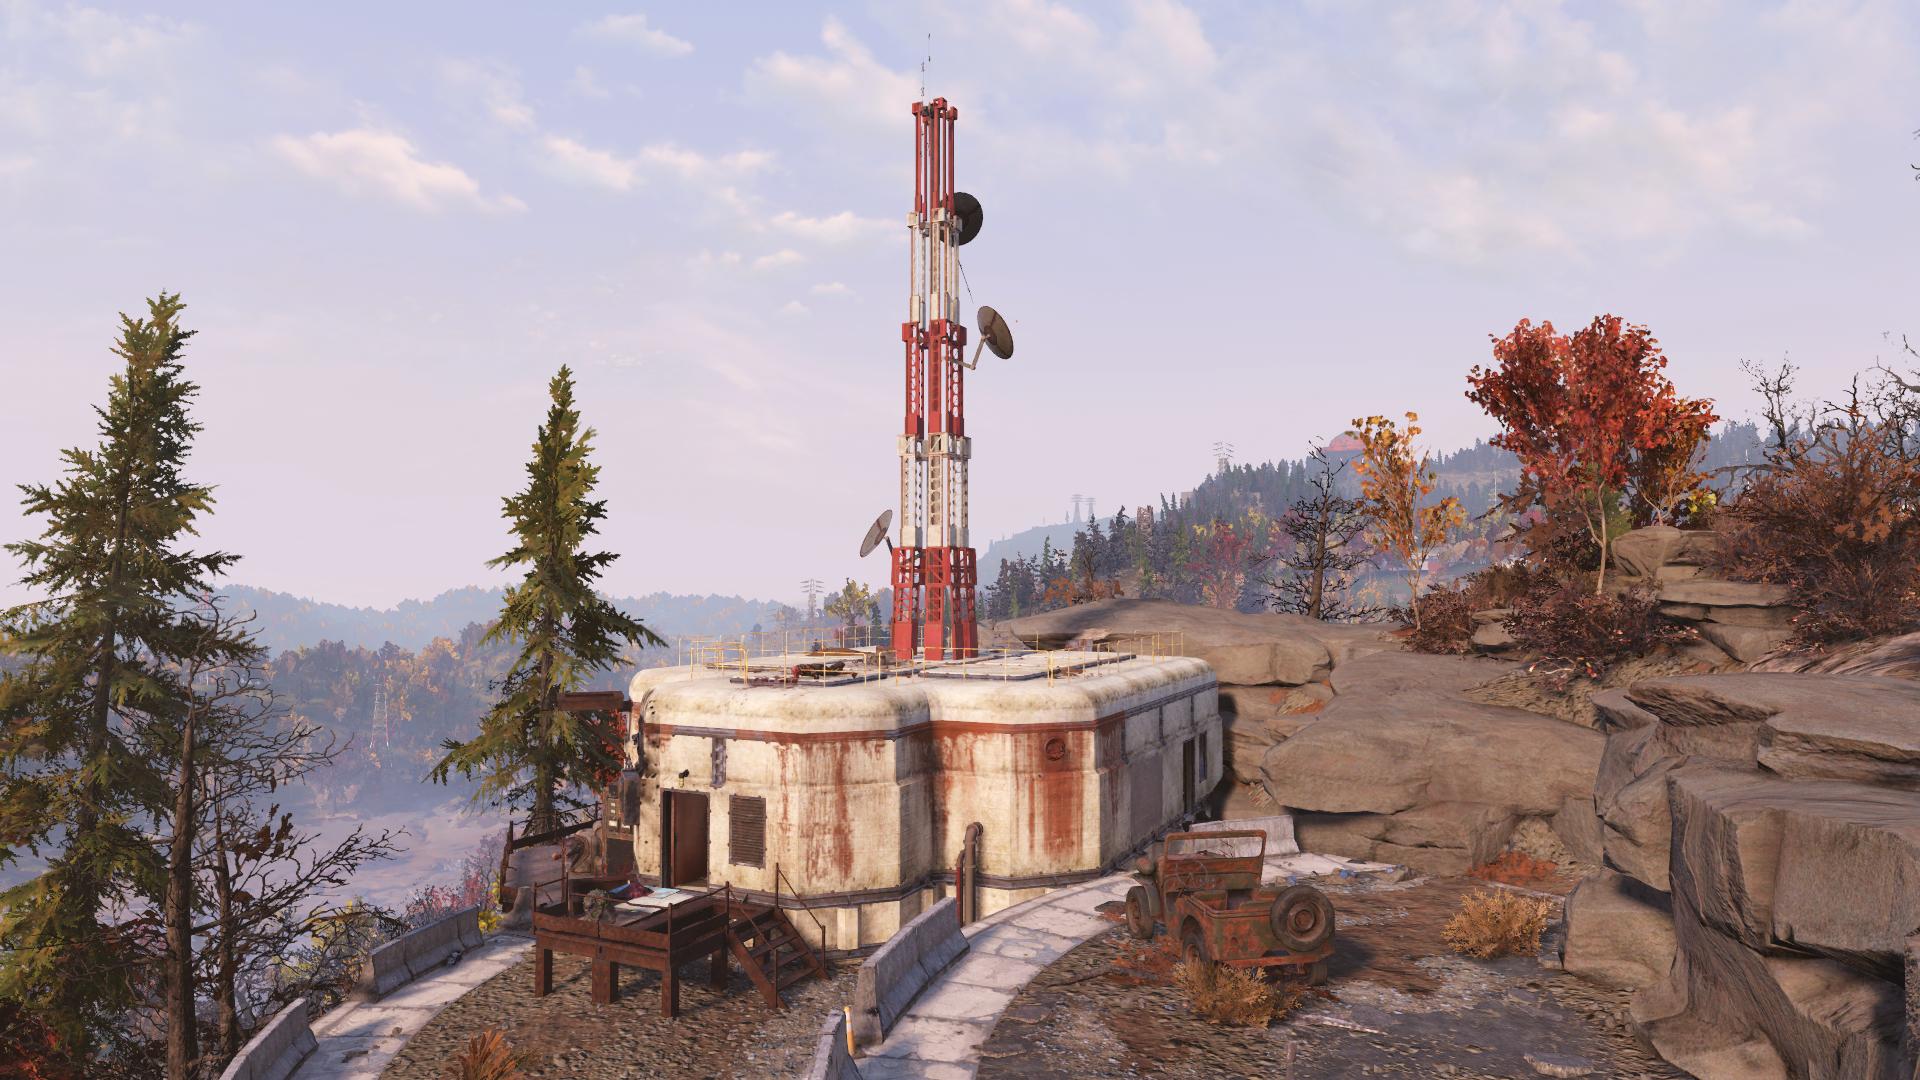 Relay tower DP-B5-21